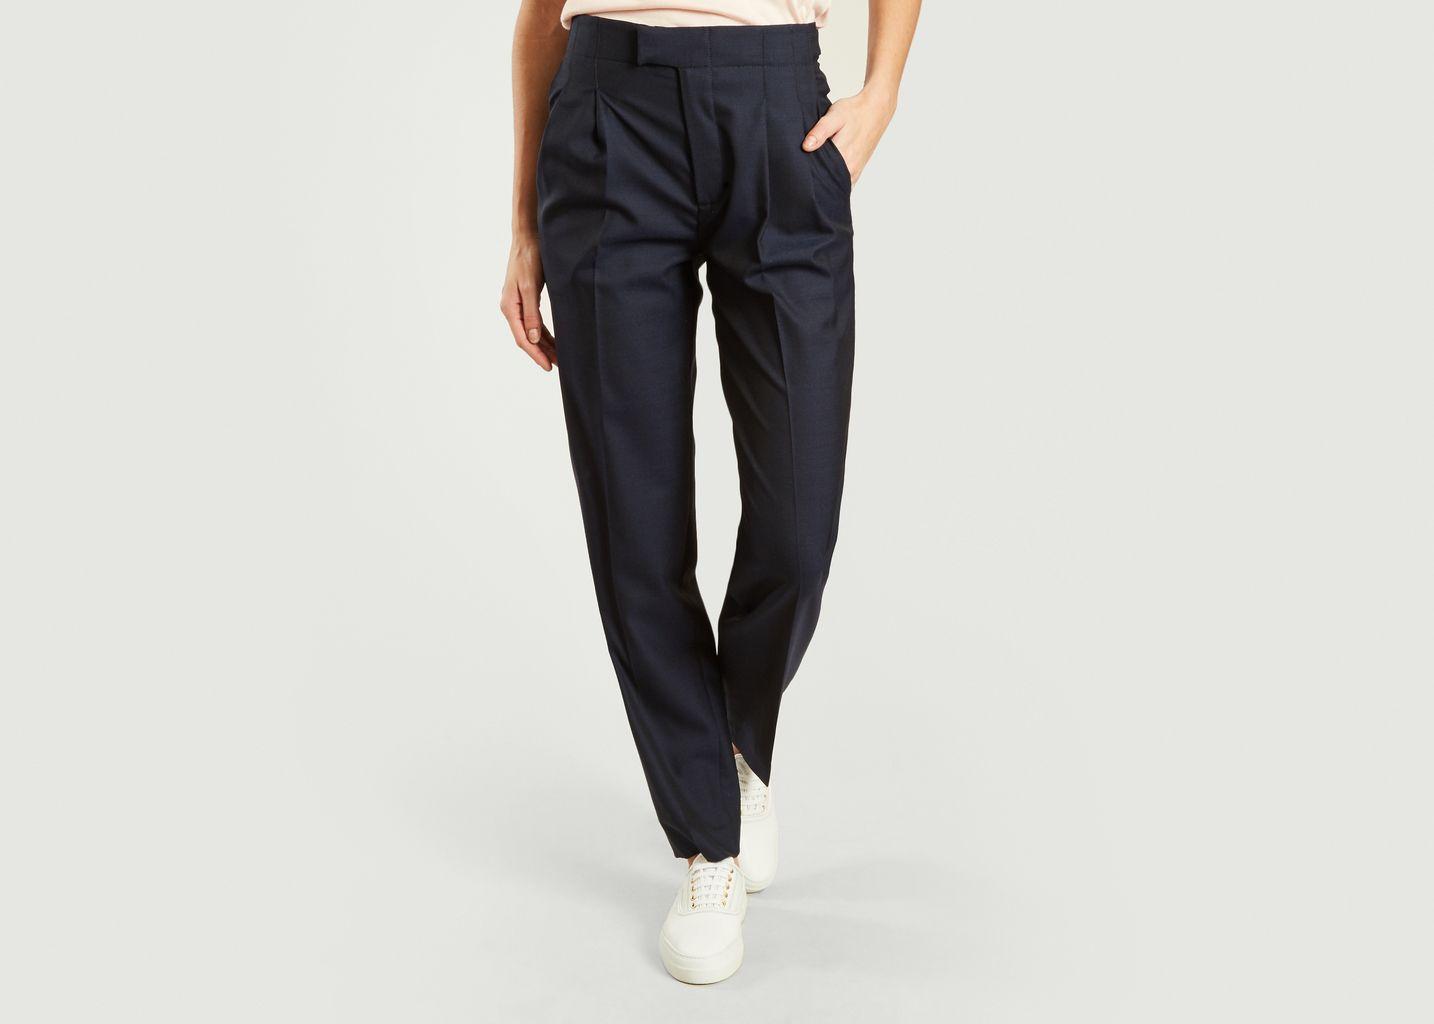 Pantalon Taille Haute - Laquintane